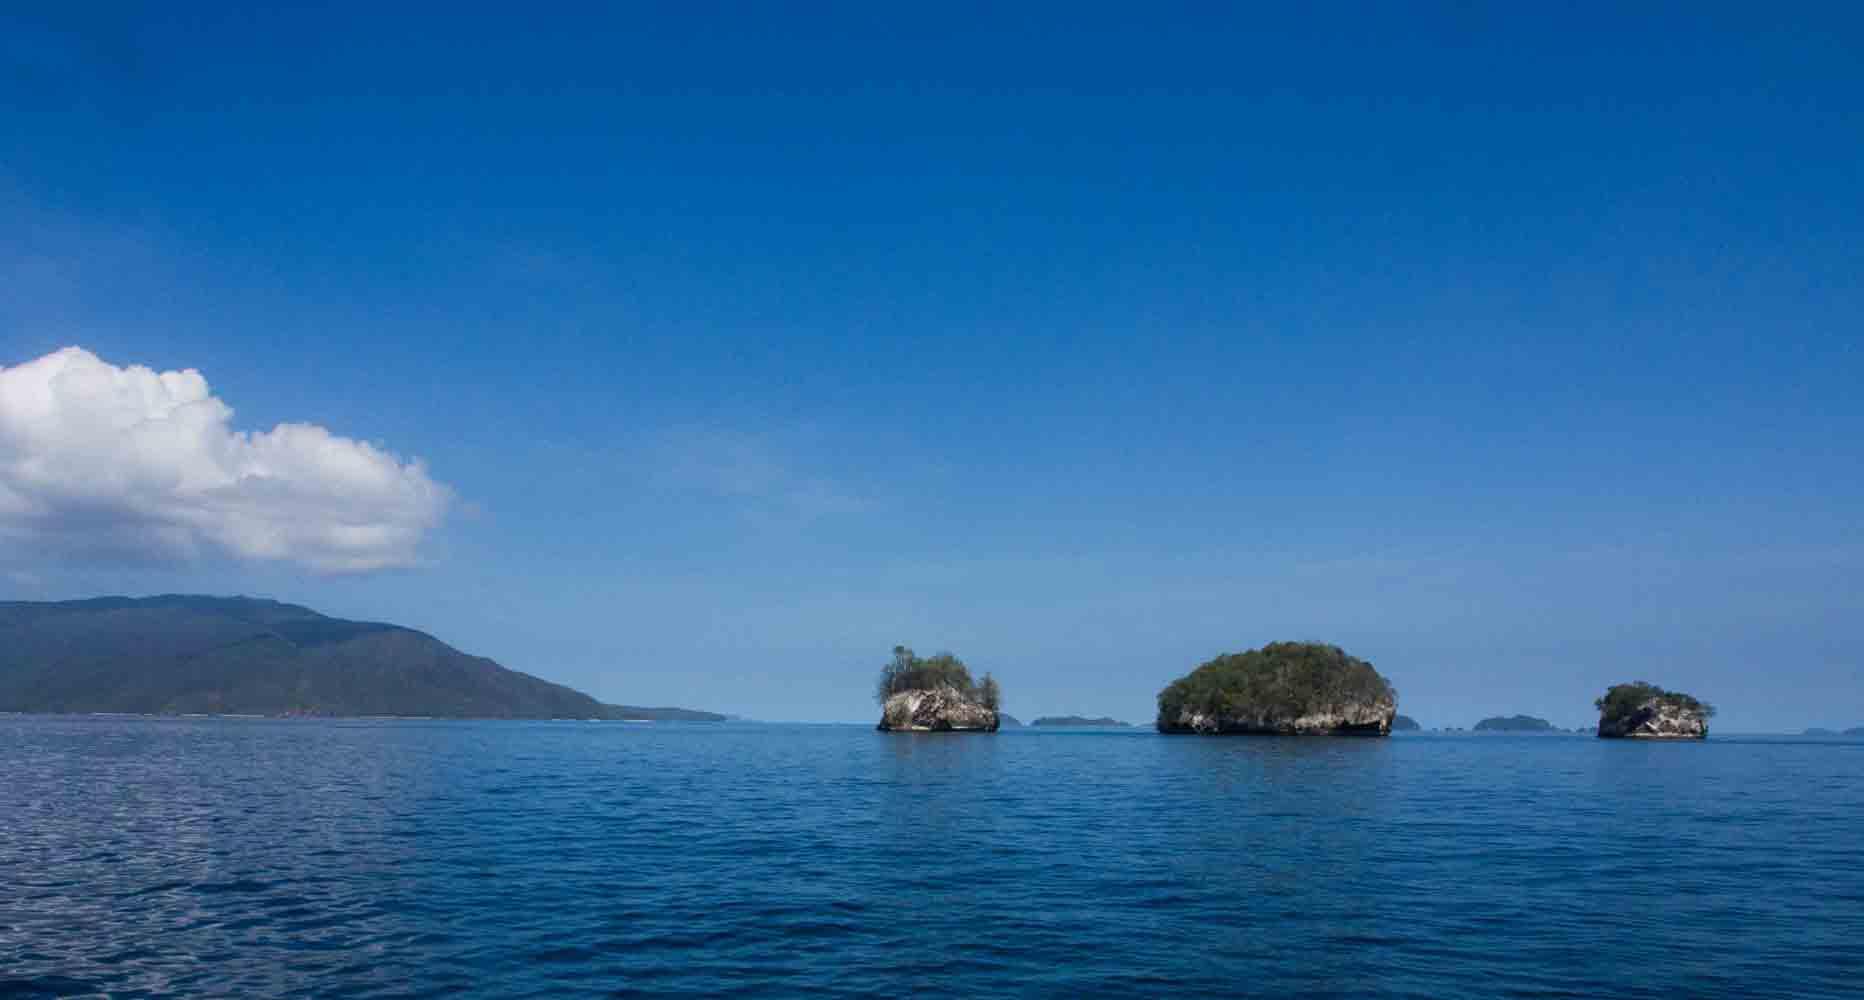 Raja Ampat Indonesien Tauchsafari, Nemo, Wobbegong, Teppichhai